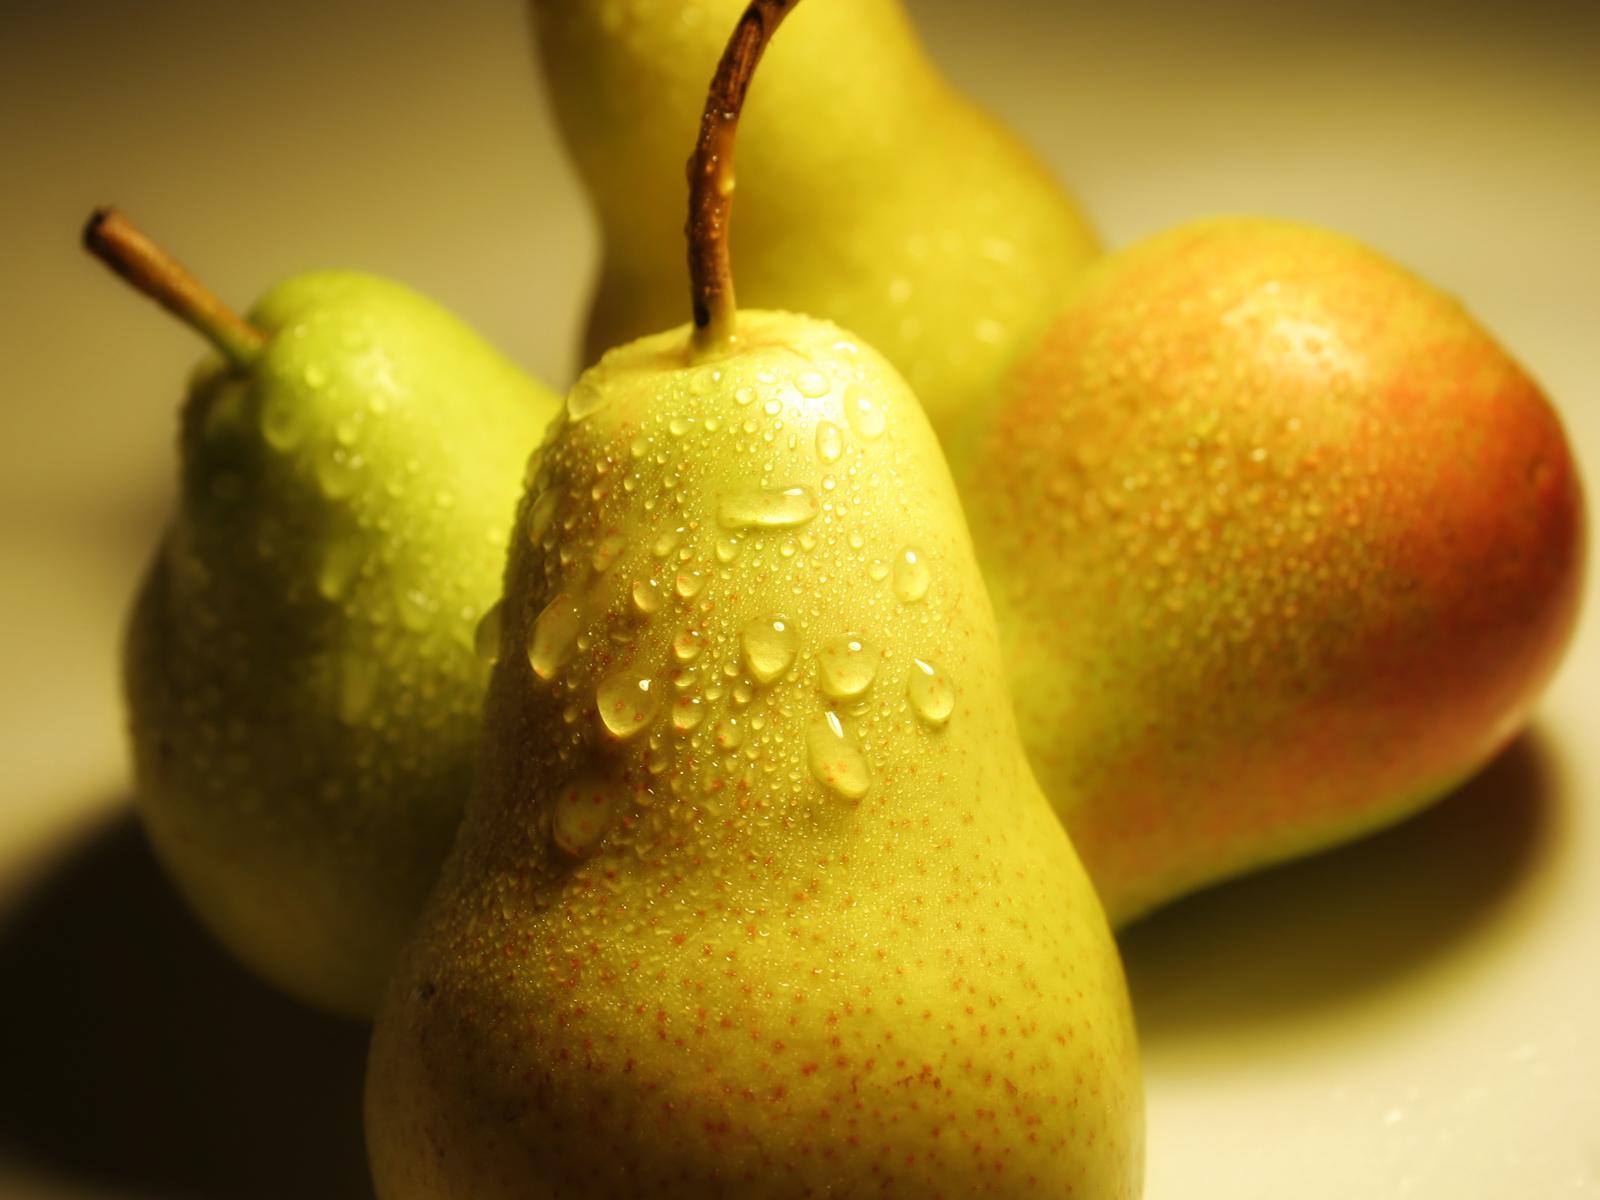 wet pears wallpaper